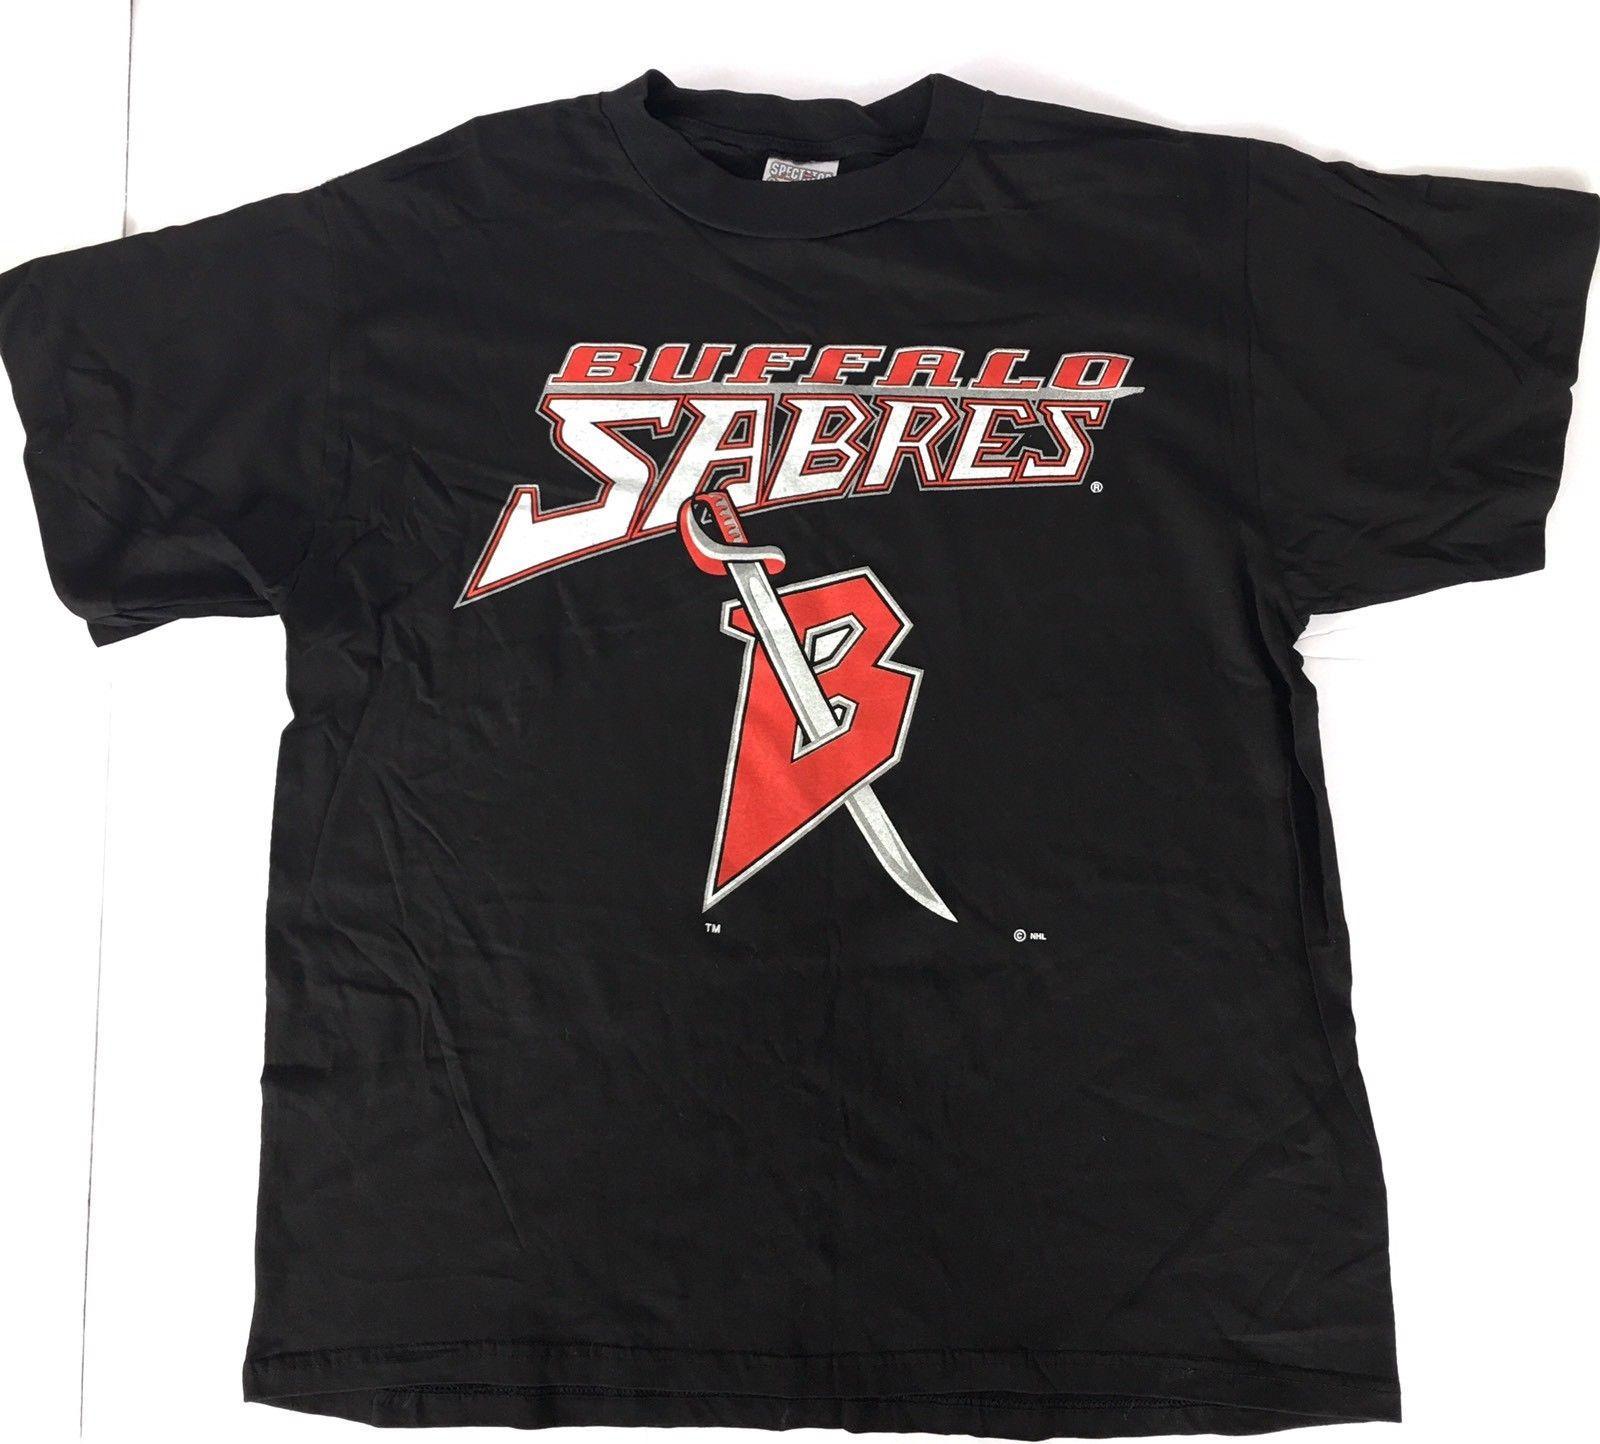 36a71f4fd Vintage Buffalo Sabres T Shirt EUC 100% Cotton XL Black Hockey Mens T Shirt  Summer O Neck 100% Cotton Men Short Sleeve Tee T Shirt Prints T Shirt  Designing ...